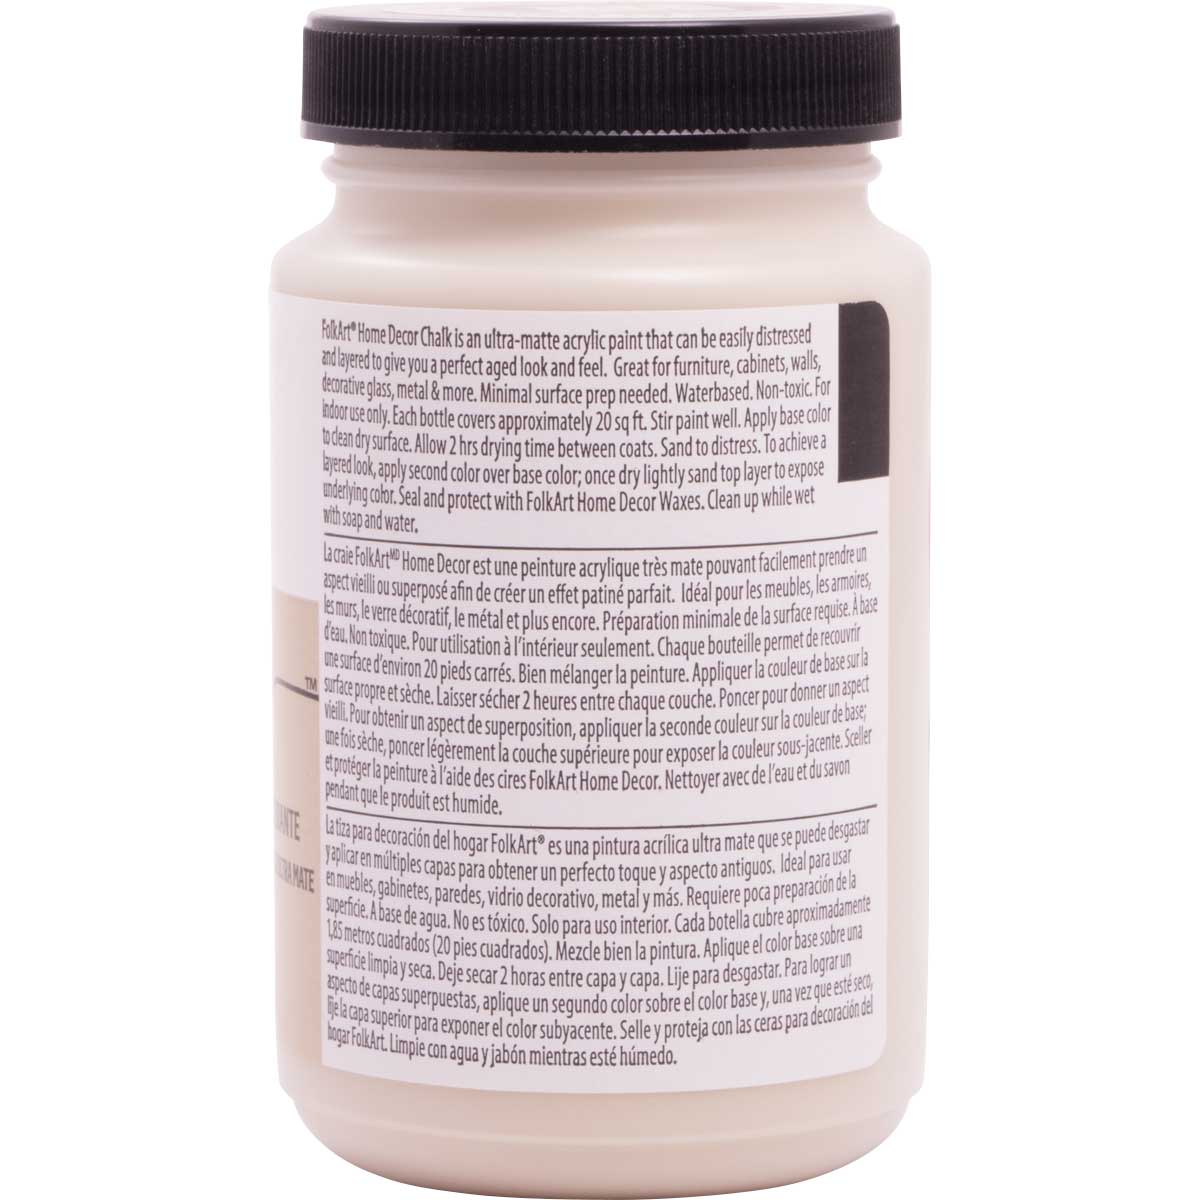 FolkArt ® Home Decor™  Chalk - Whispering Wheat, 8 oz. - 34181